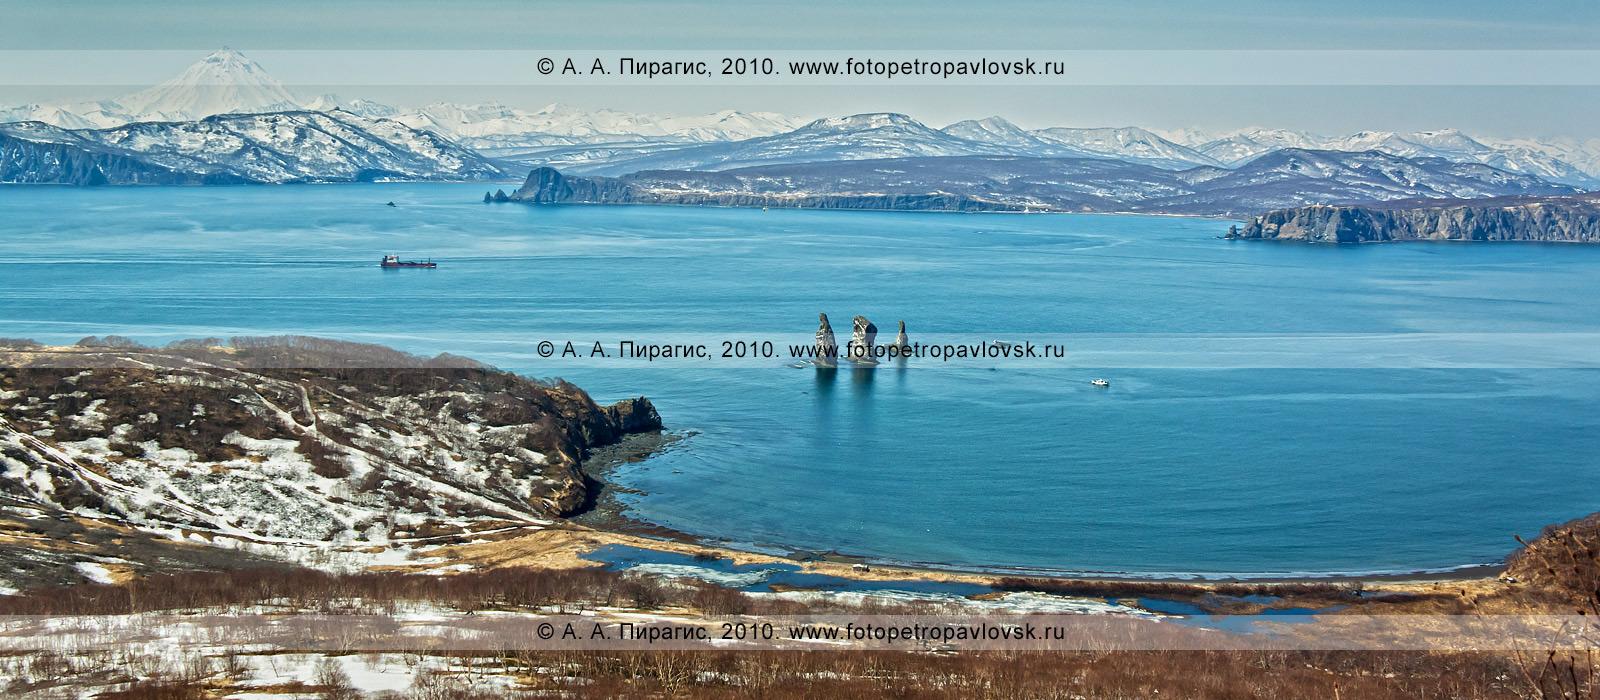 Фотография панорама скалы три брата